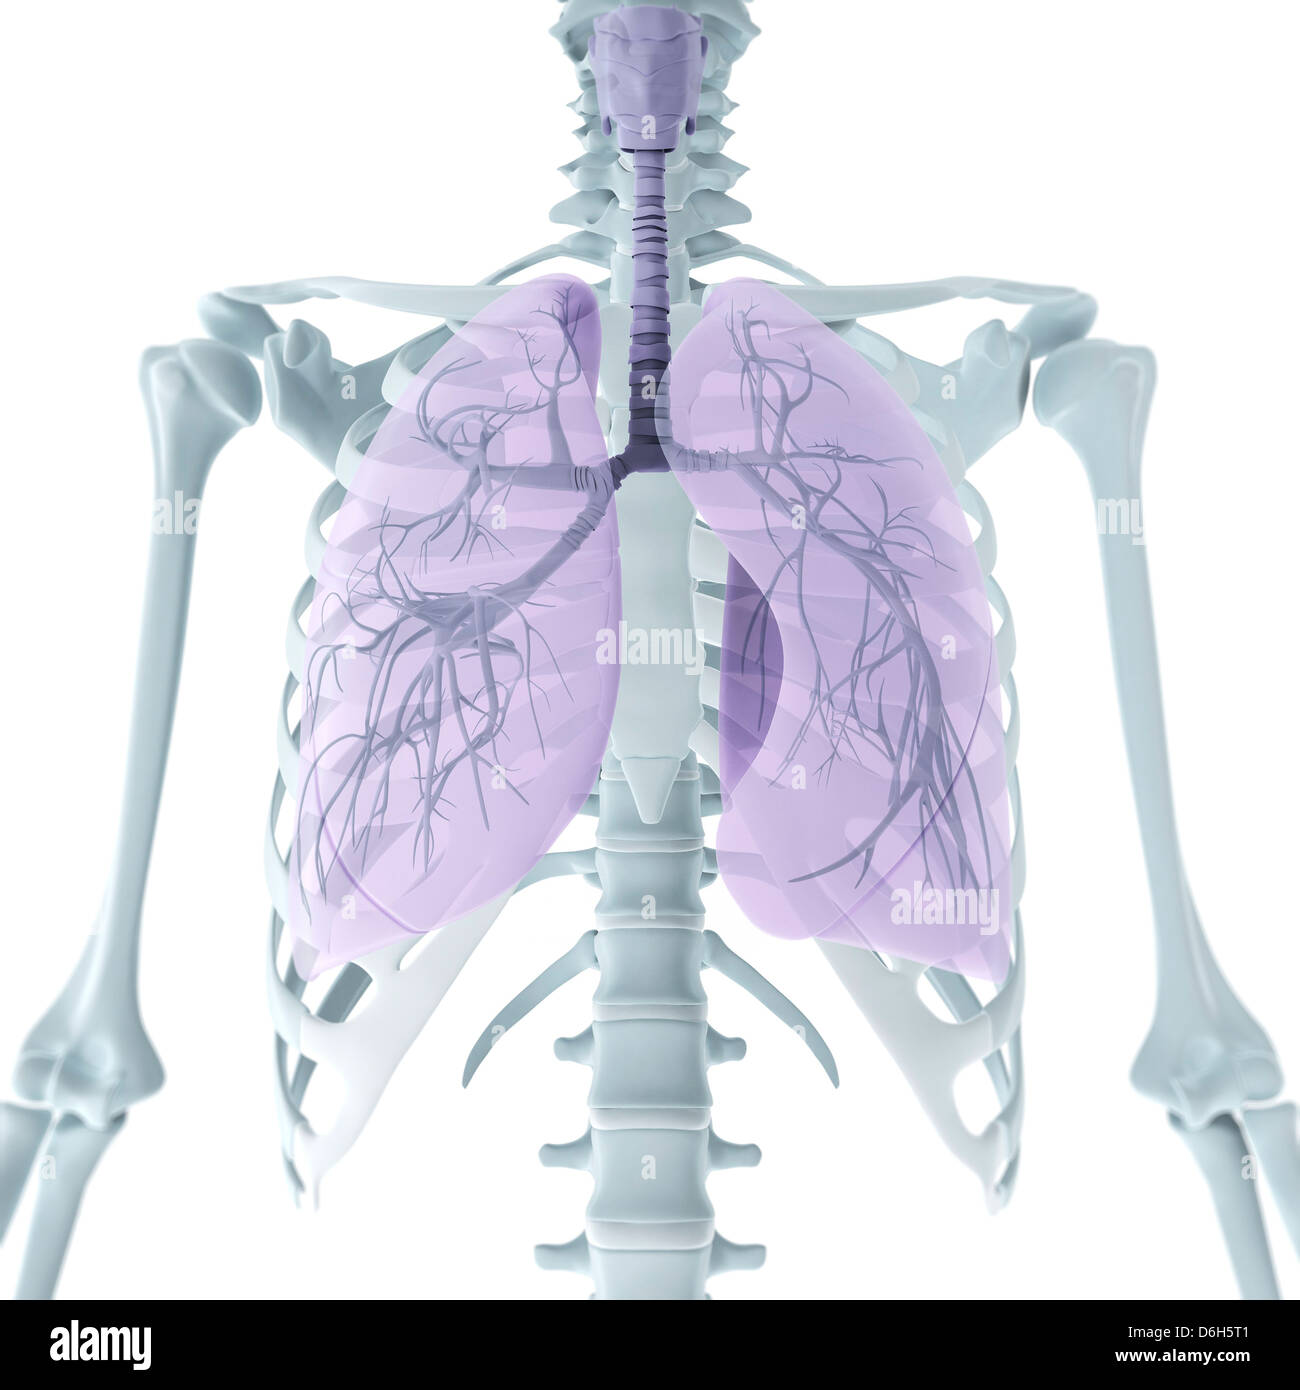 Oberkörper-Anatomie, artwork Stockfoto, Bild: 55696817 - Alamy